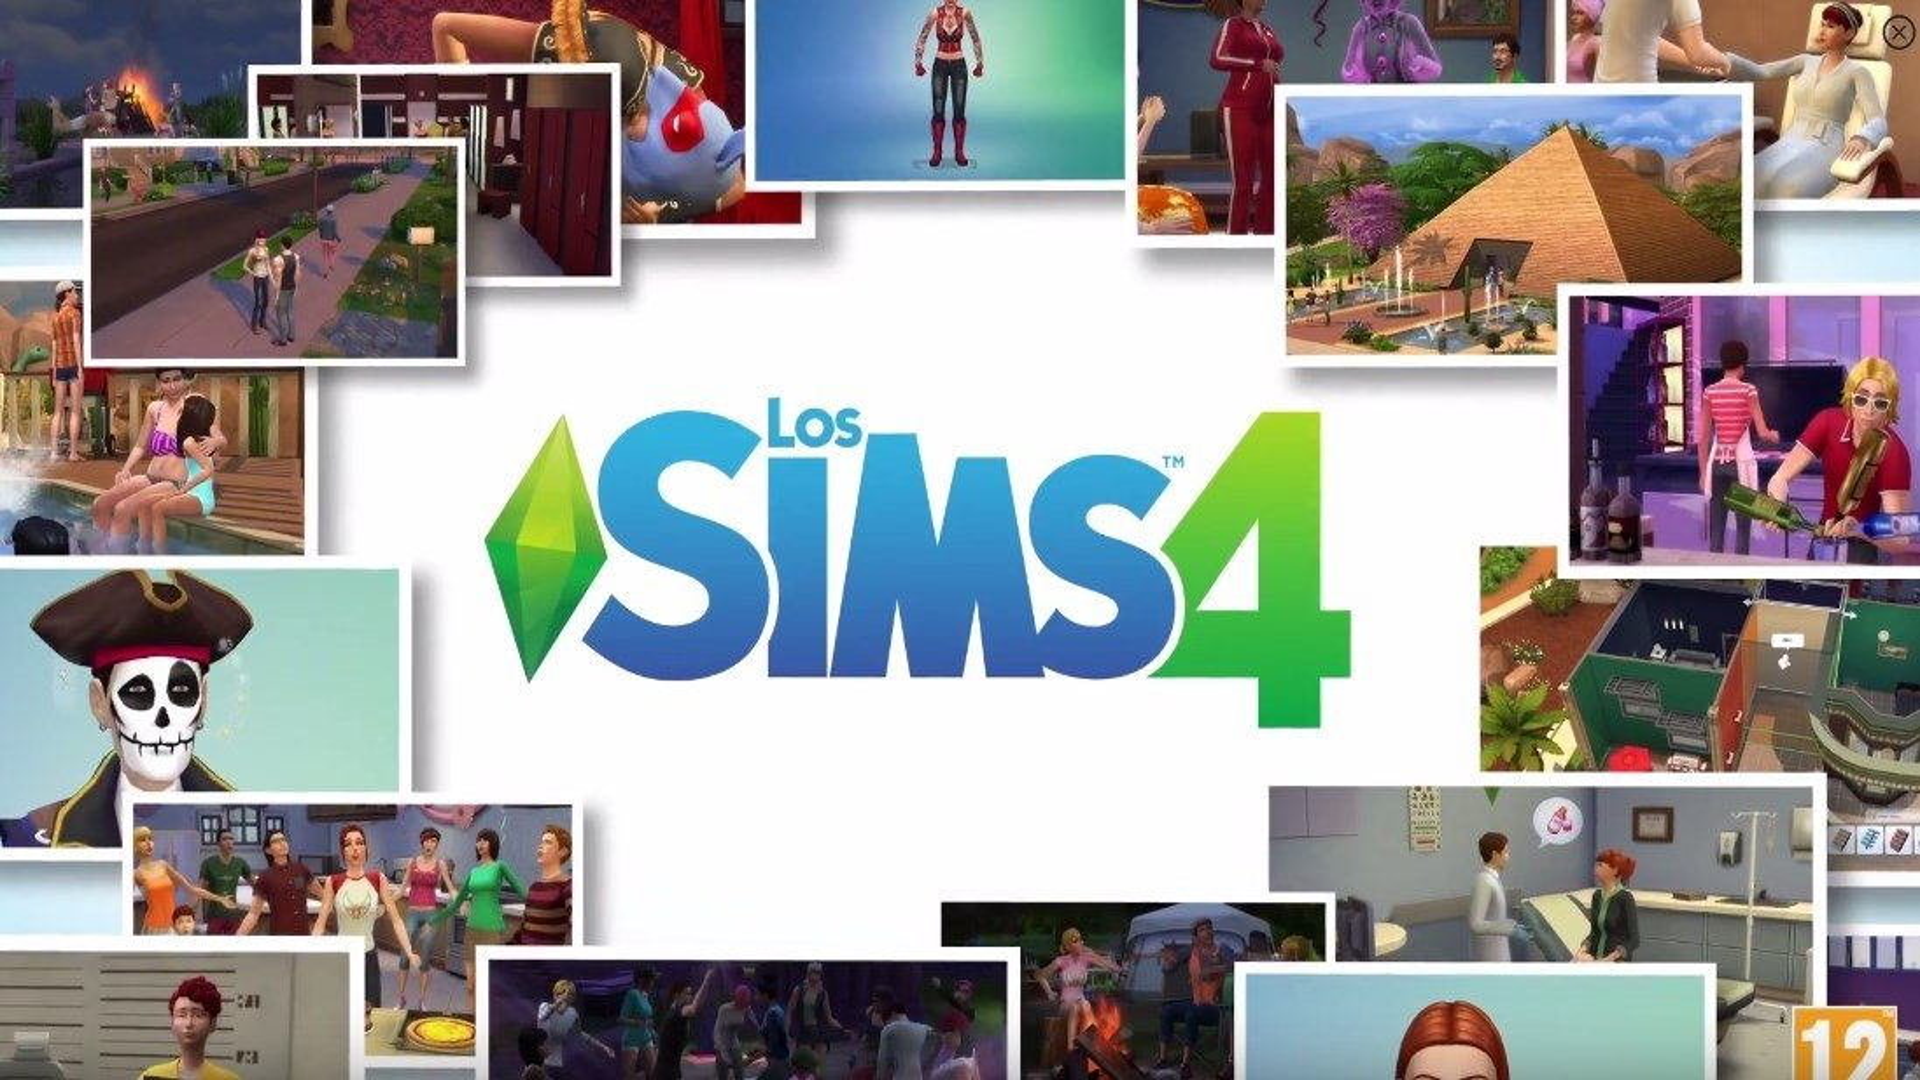 Les Sims 4 Mac image 5